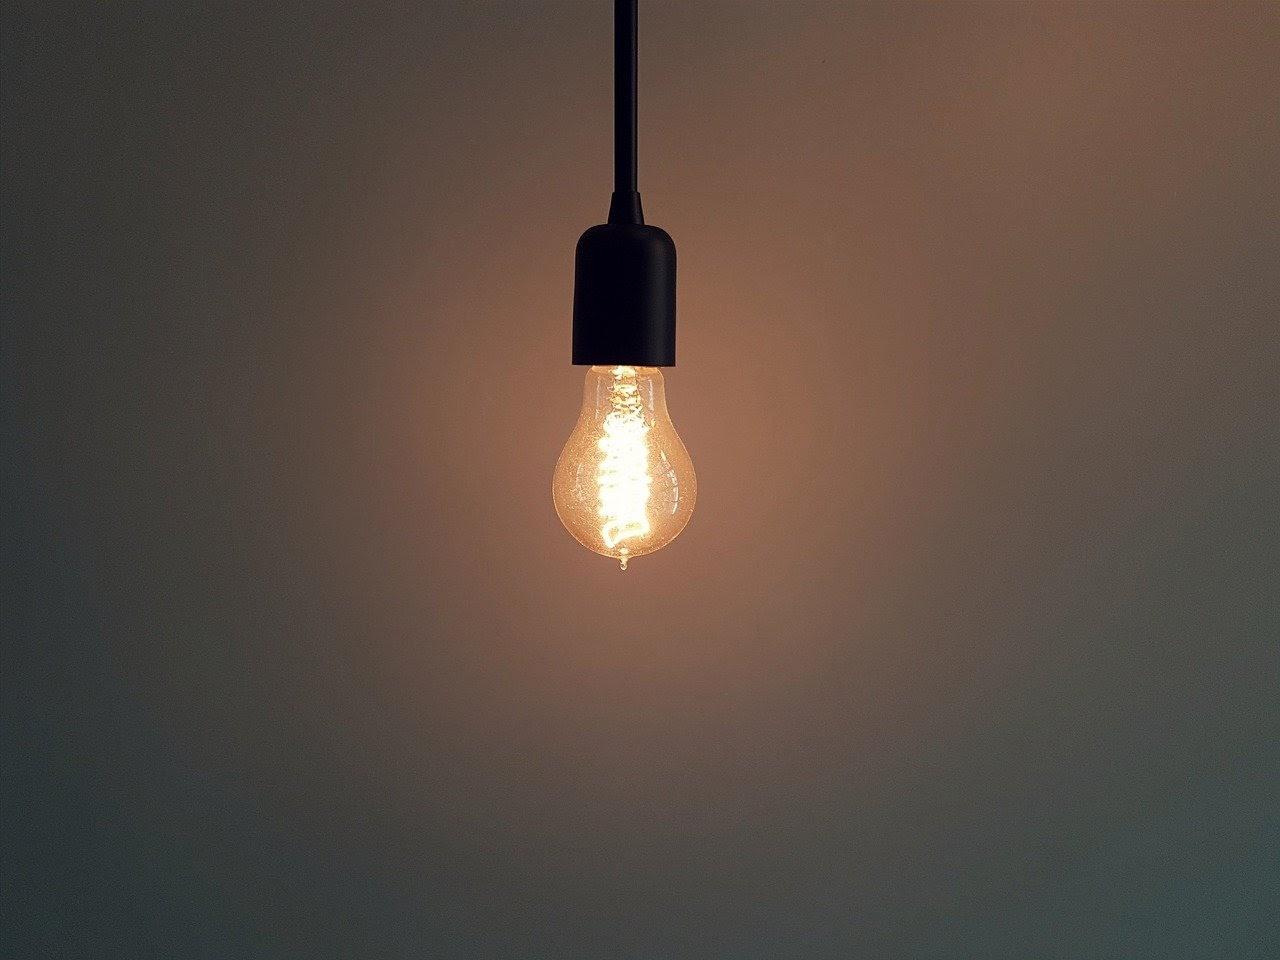 bombilla-encendida-pobreza-energética